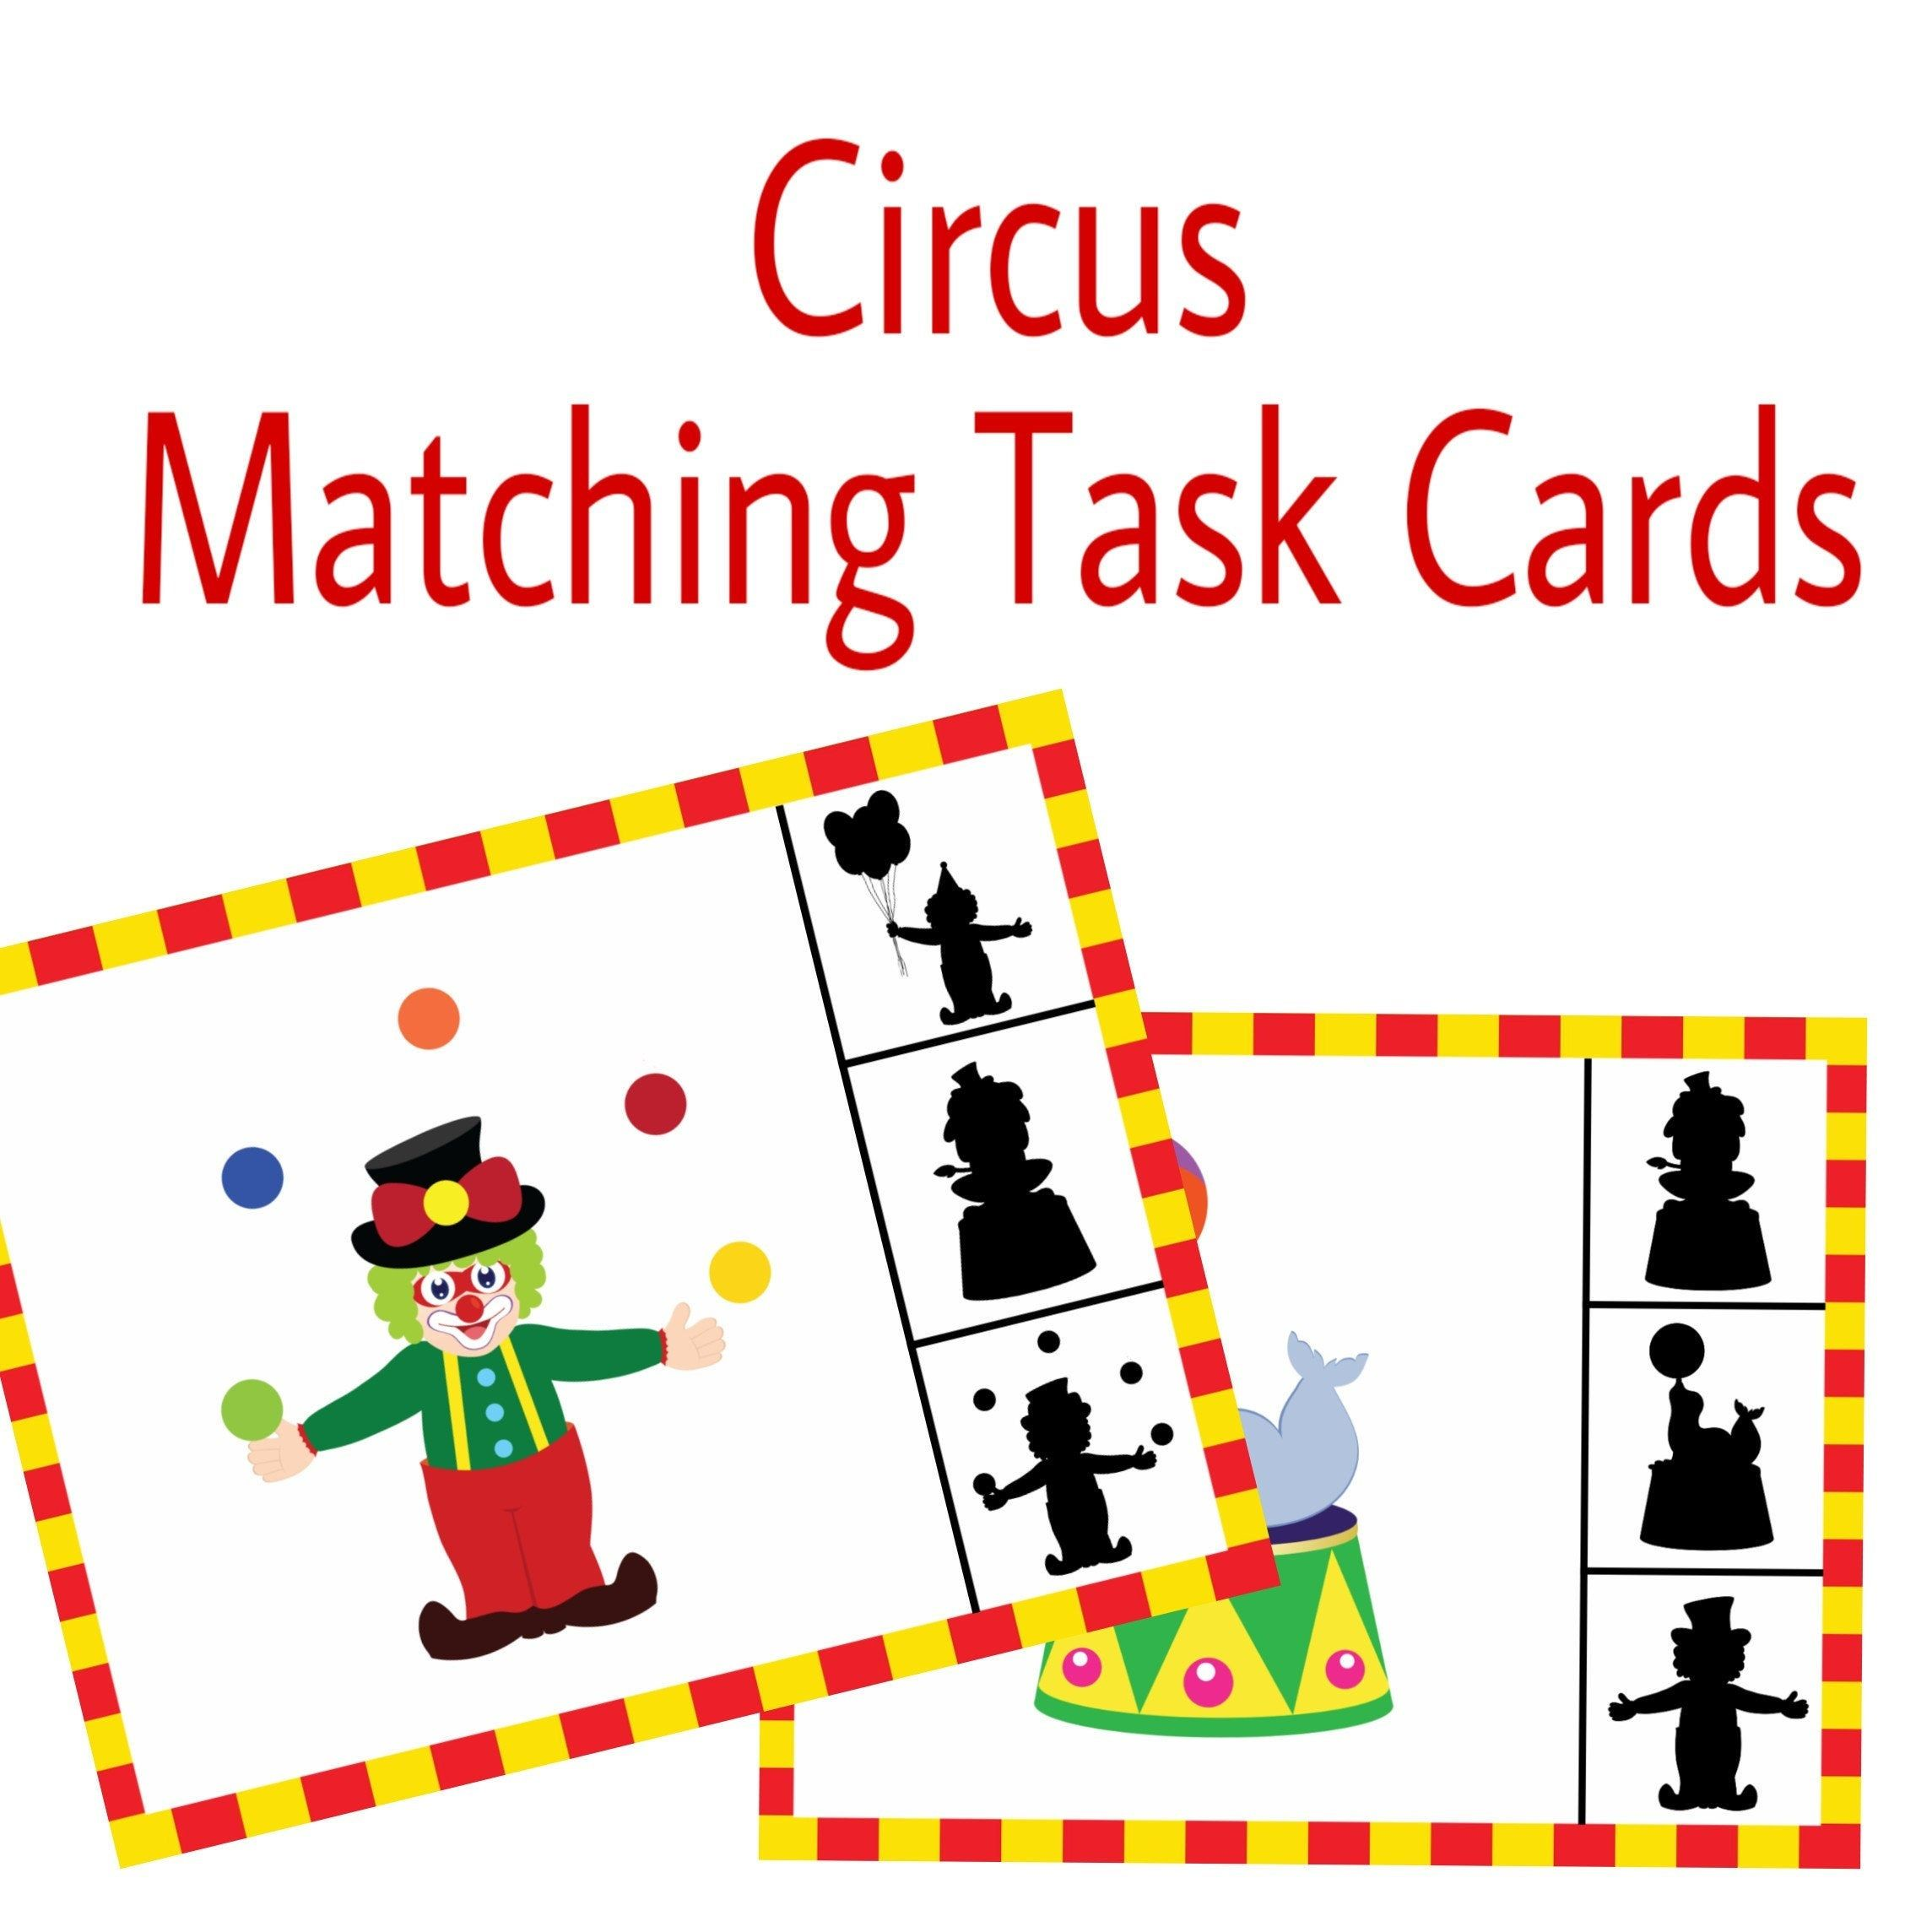 Circus Task Cards Matching Activity Printable Worksheet